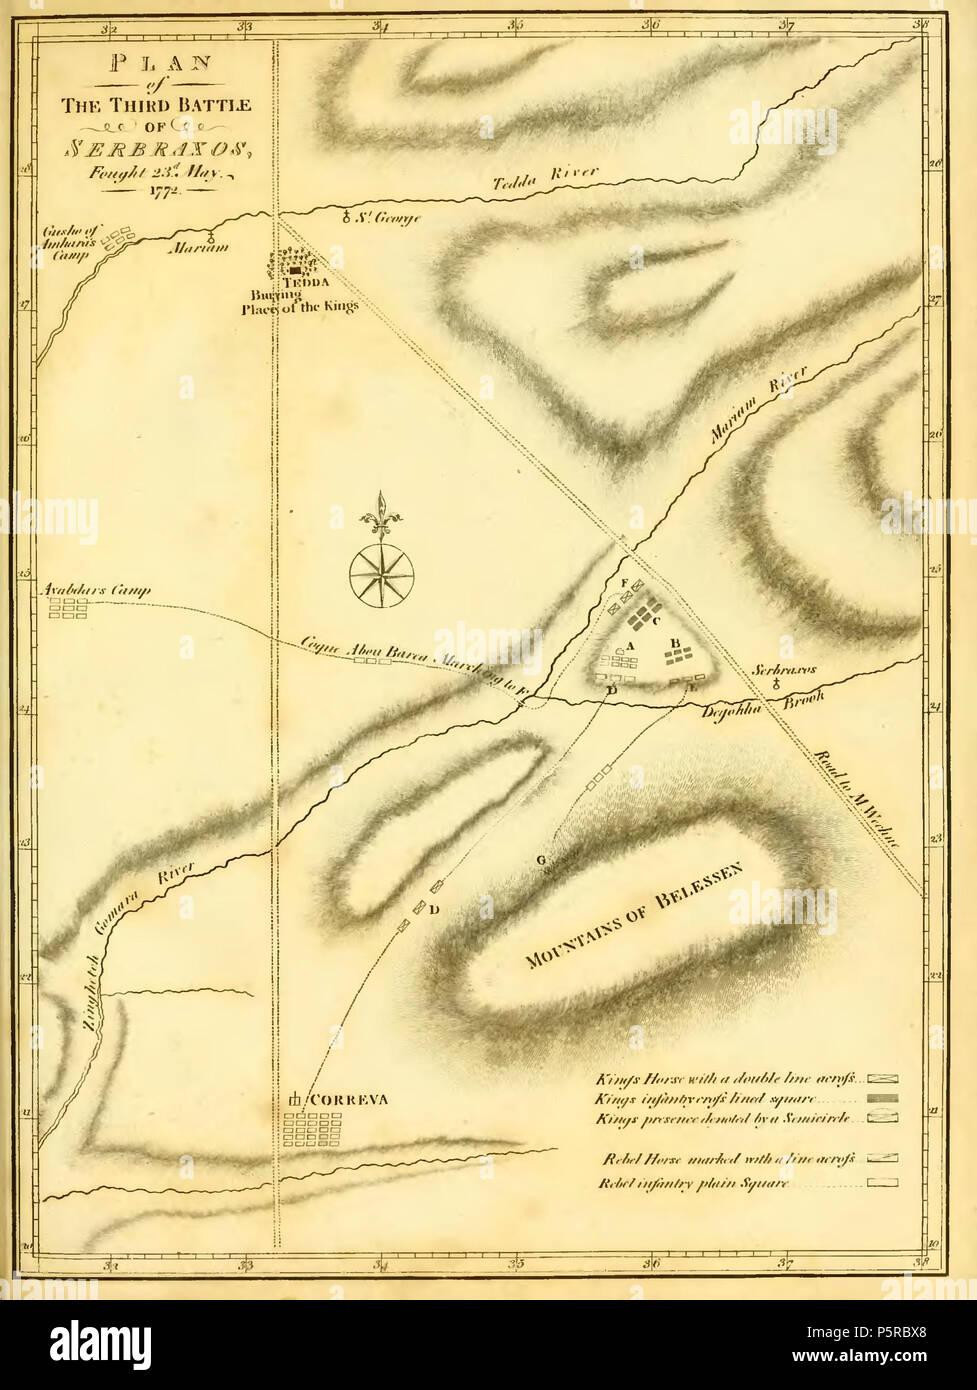 medium resolution of n a english diagram of the three battles of sarbakusa actions of 23 may 1772 1790 james bruce 242 bruce battles of sarbakusa03